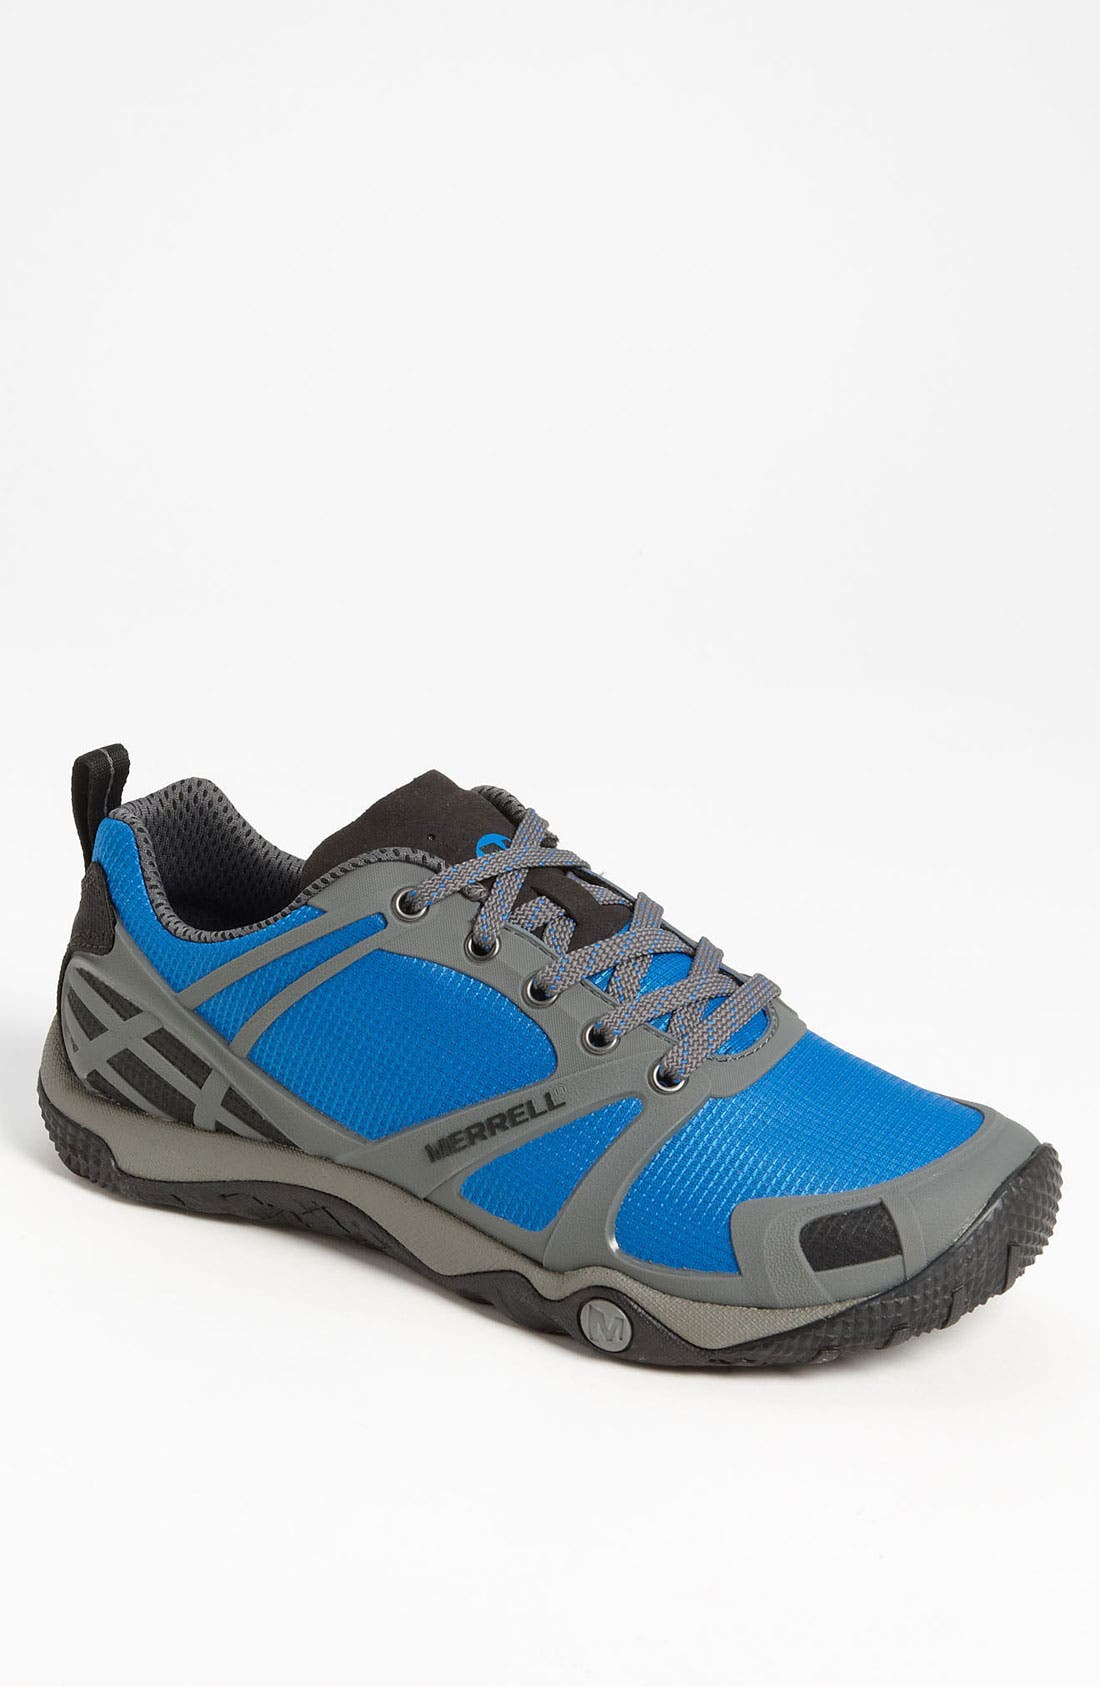 Main Image - Merrell 'Proterra' Hiking Shoe (Men)